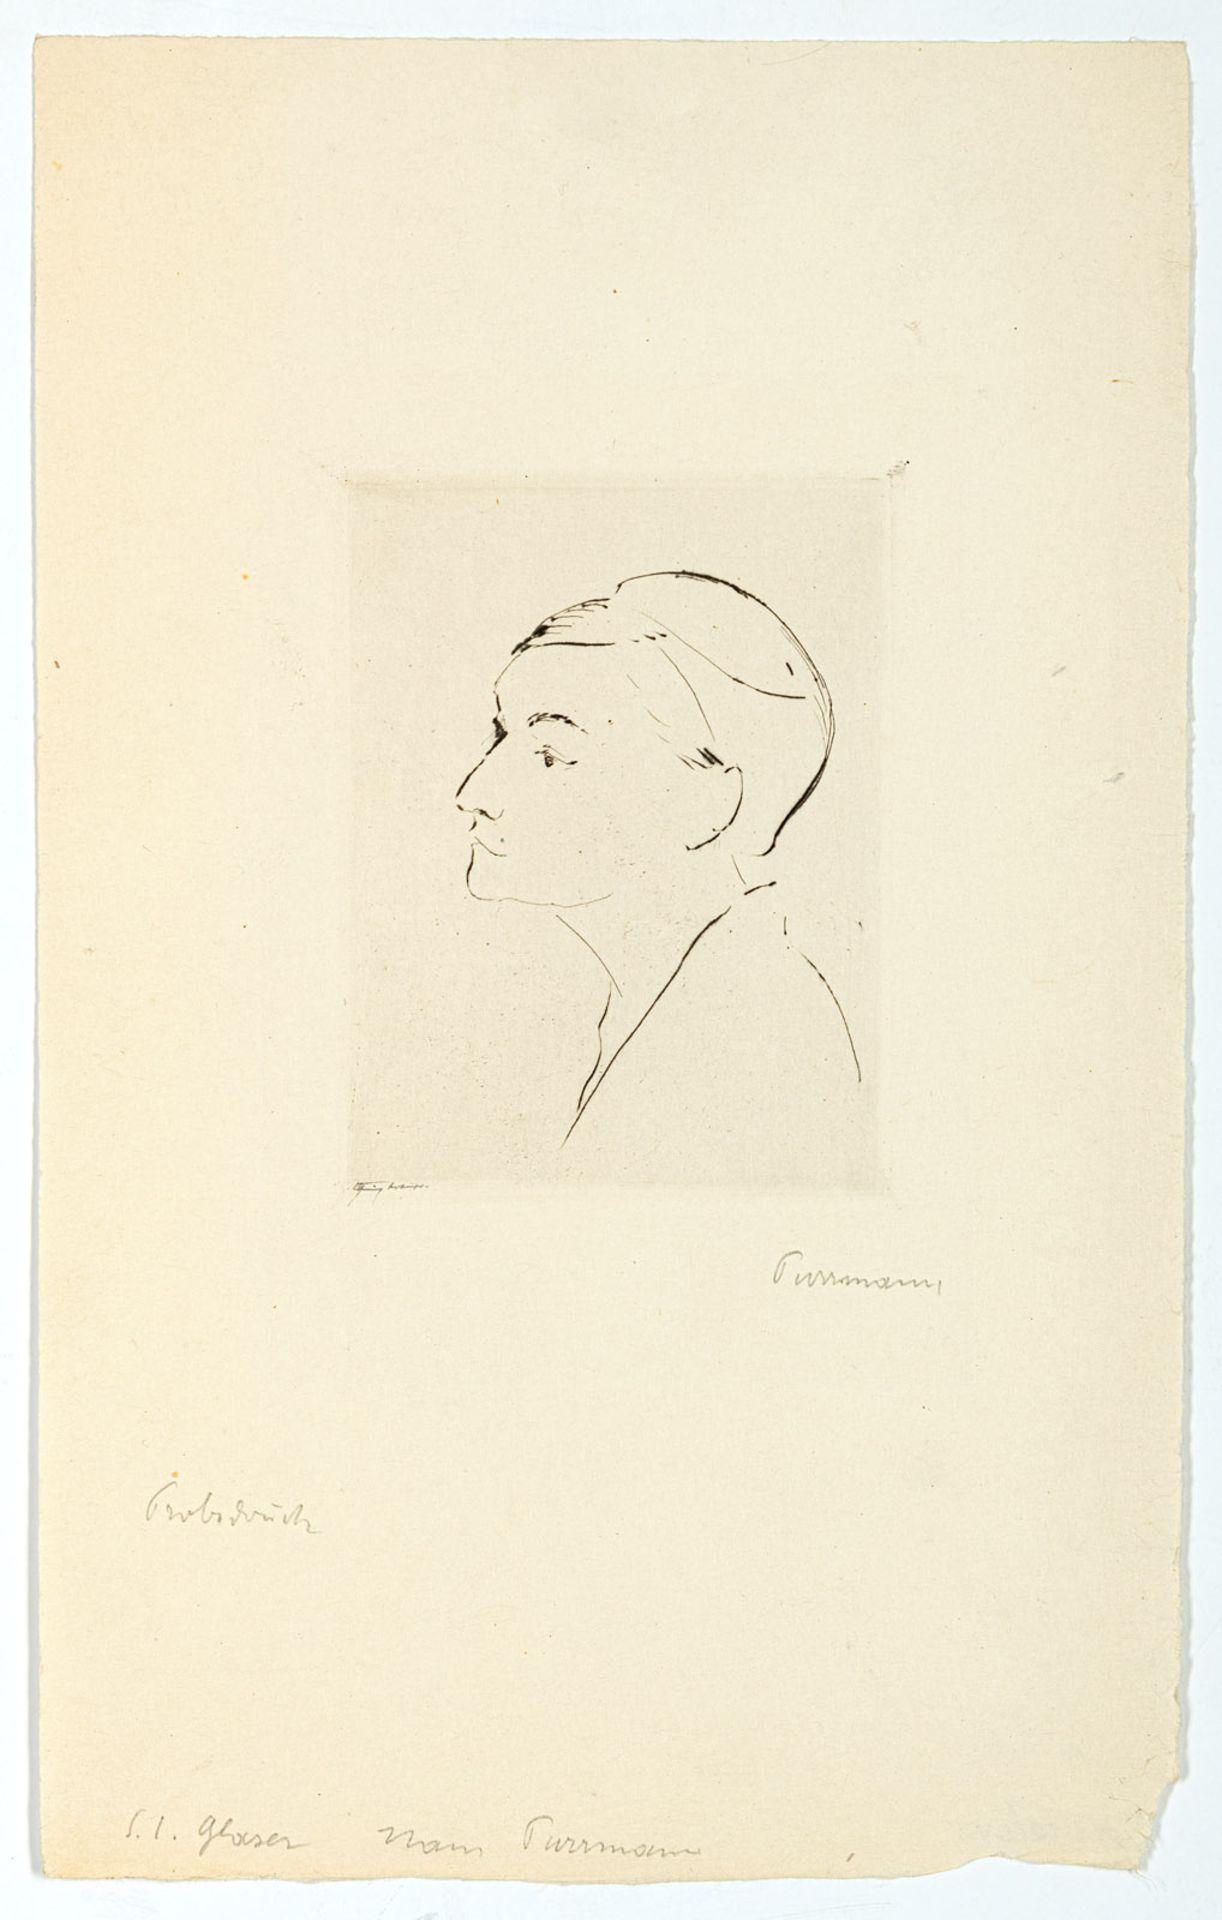 Purrmann, Hans - Image 2 of 3